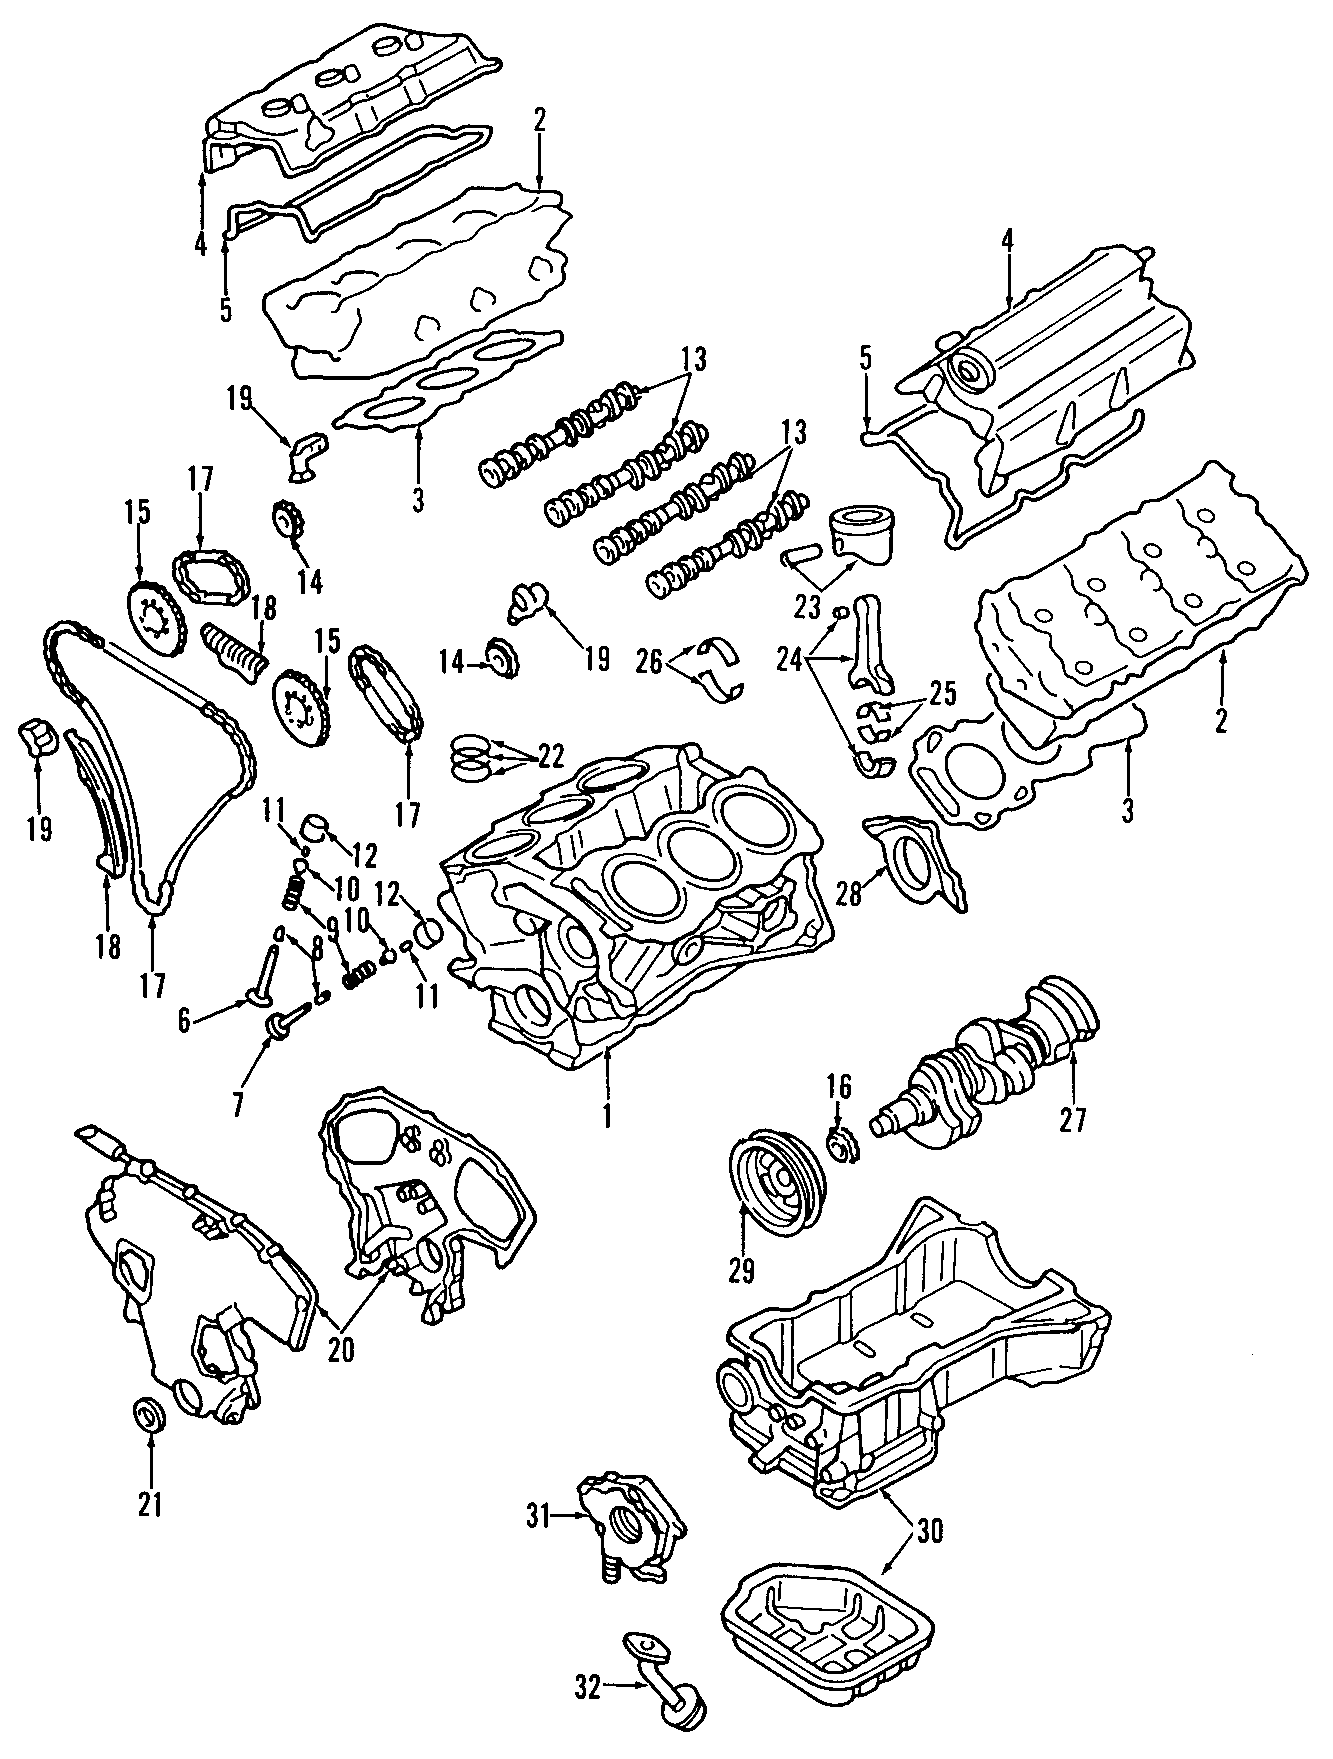 Nissan Frontier Engine Oil Pump Pickup Tube Engine Oil